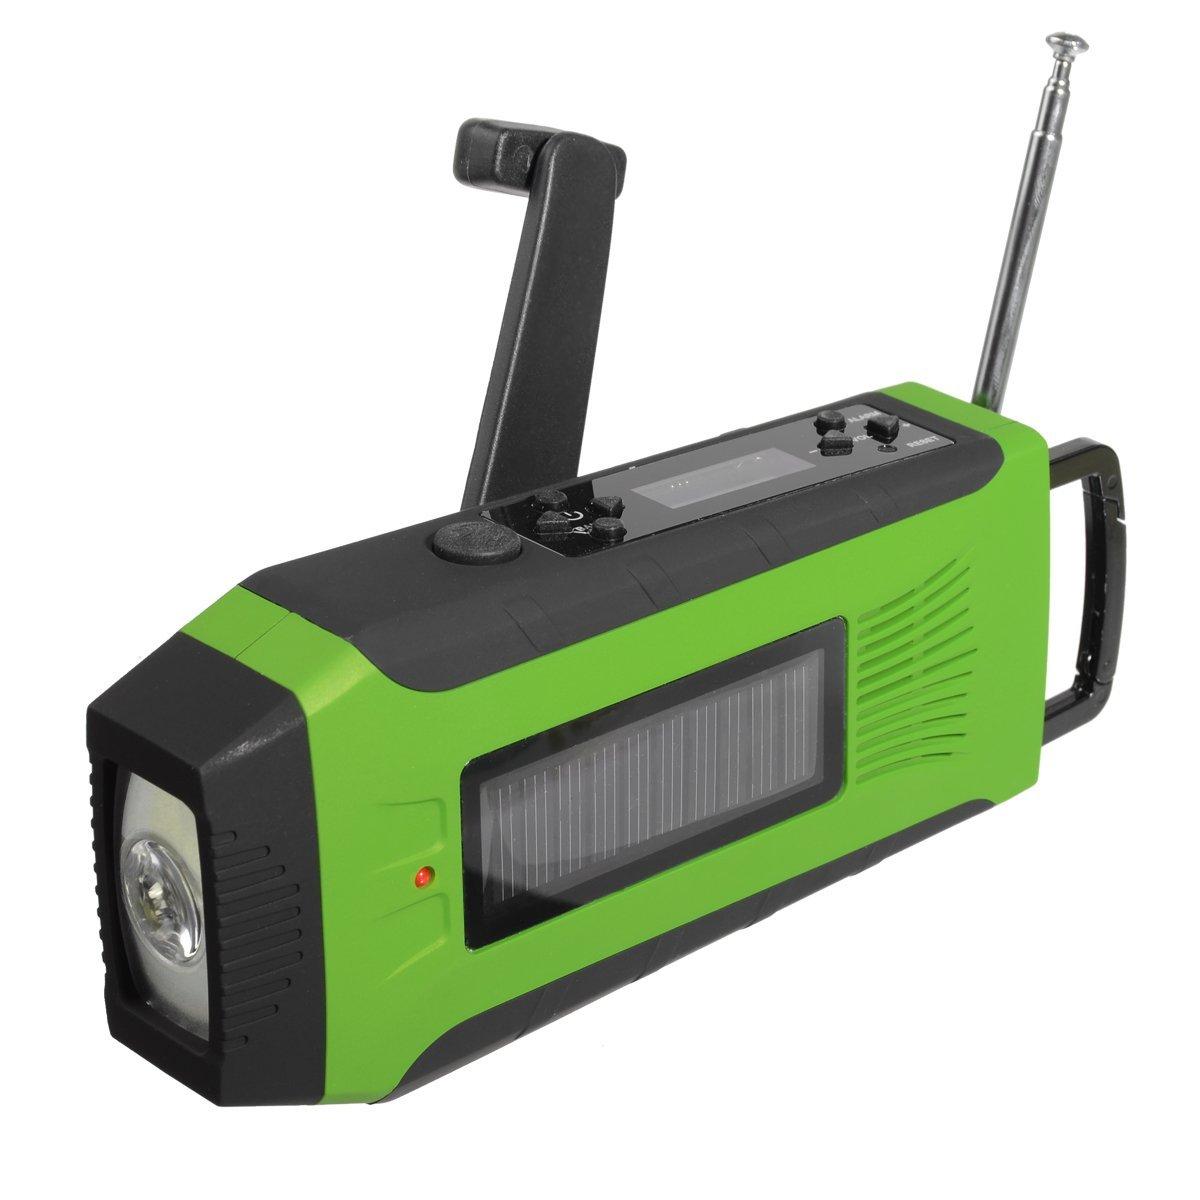 Outdoor Radio Dynamo Survival Solar Self Powered AM FM NOAA Weather Radio  Phone Power Bank